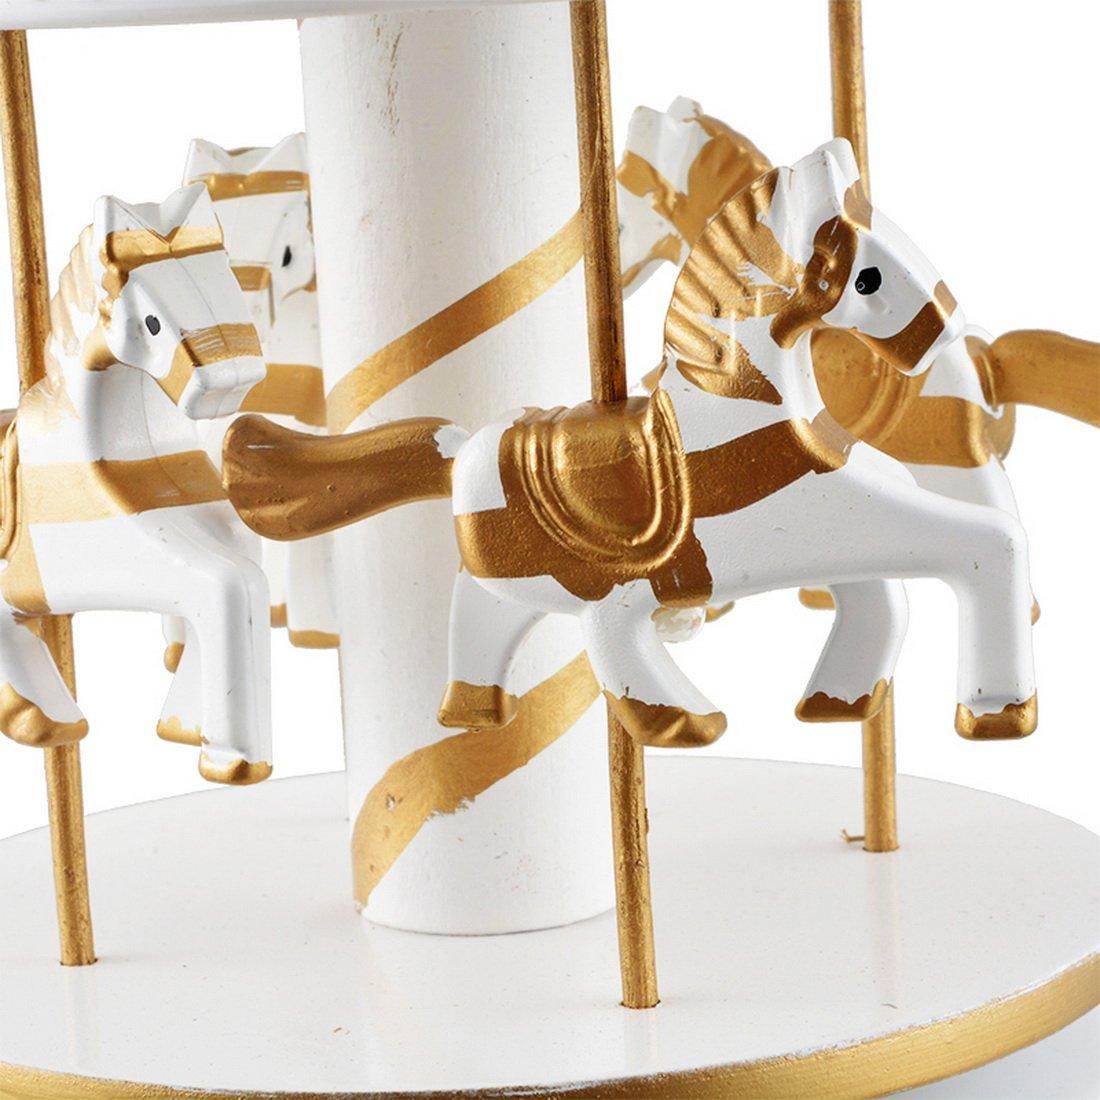 Souarts Color dorado giratorio Carrusel Caballo Musical caja con castillo en el cielo para cumplea/ños fiesta de Navidad 1/pc